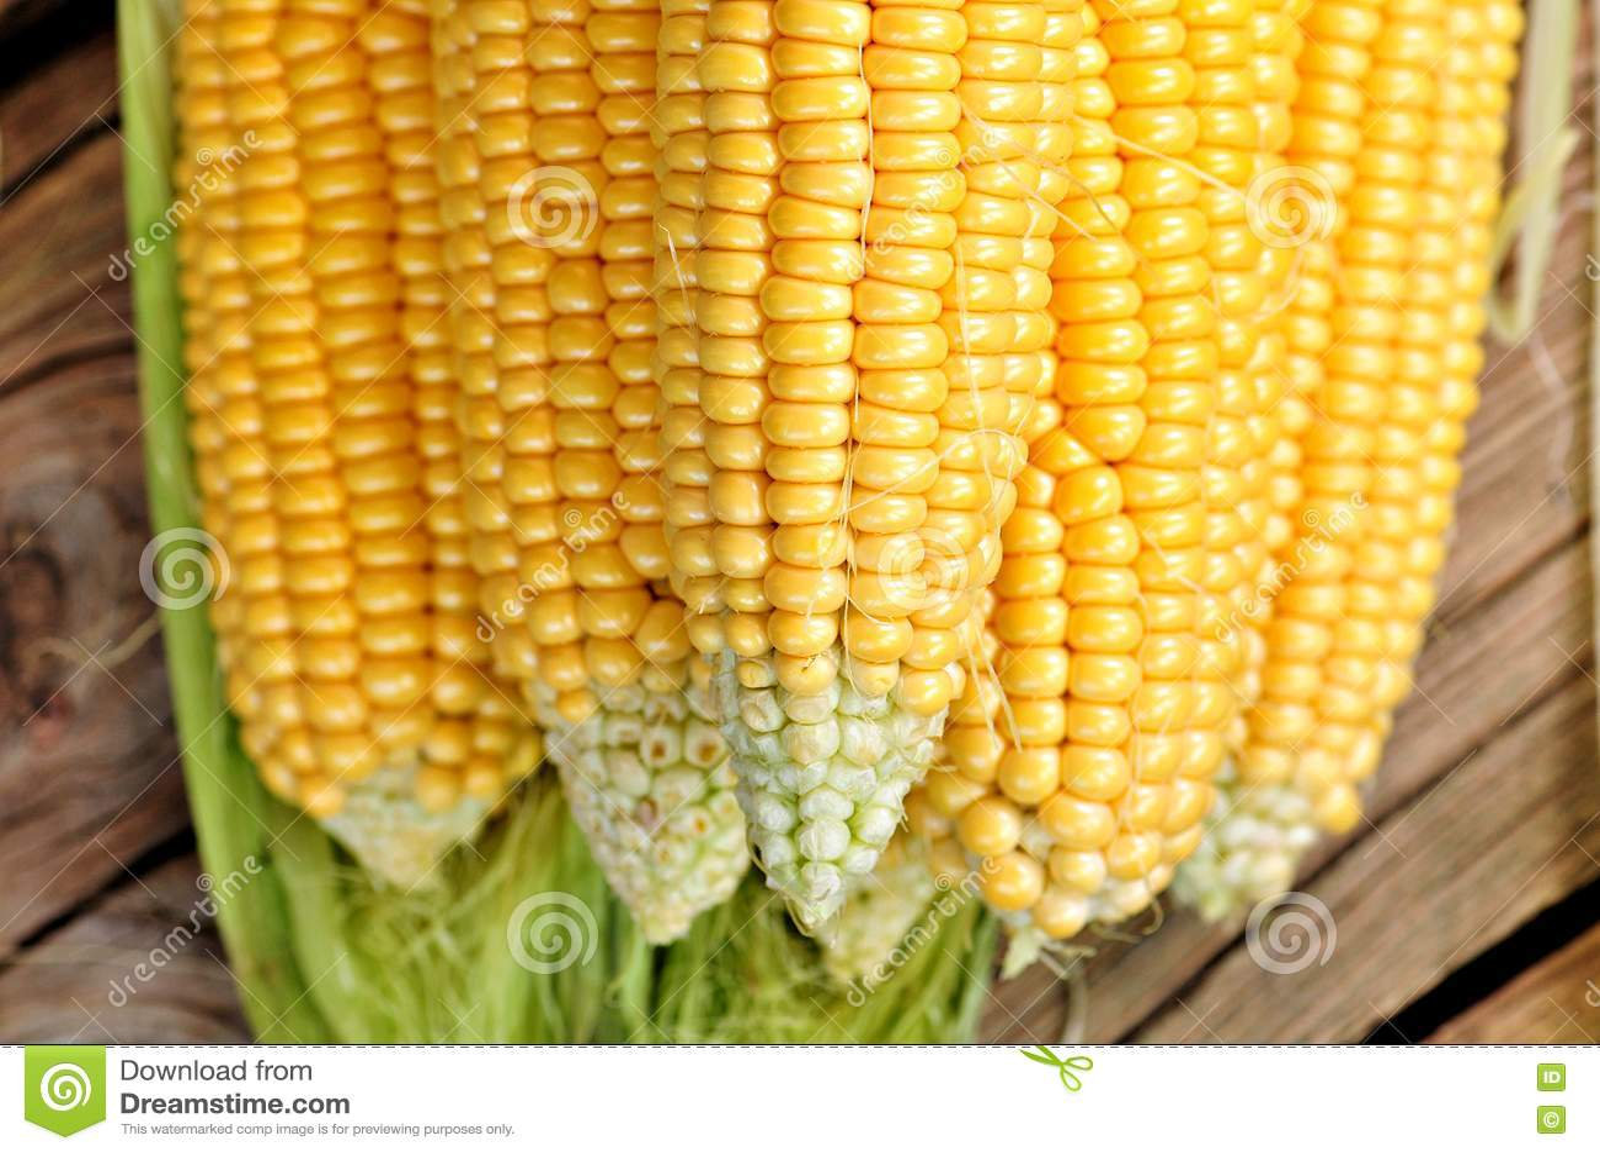 Milho amarelo orgânico Fundo Alimento delicioso